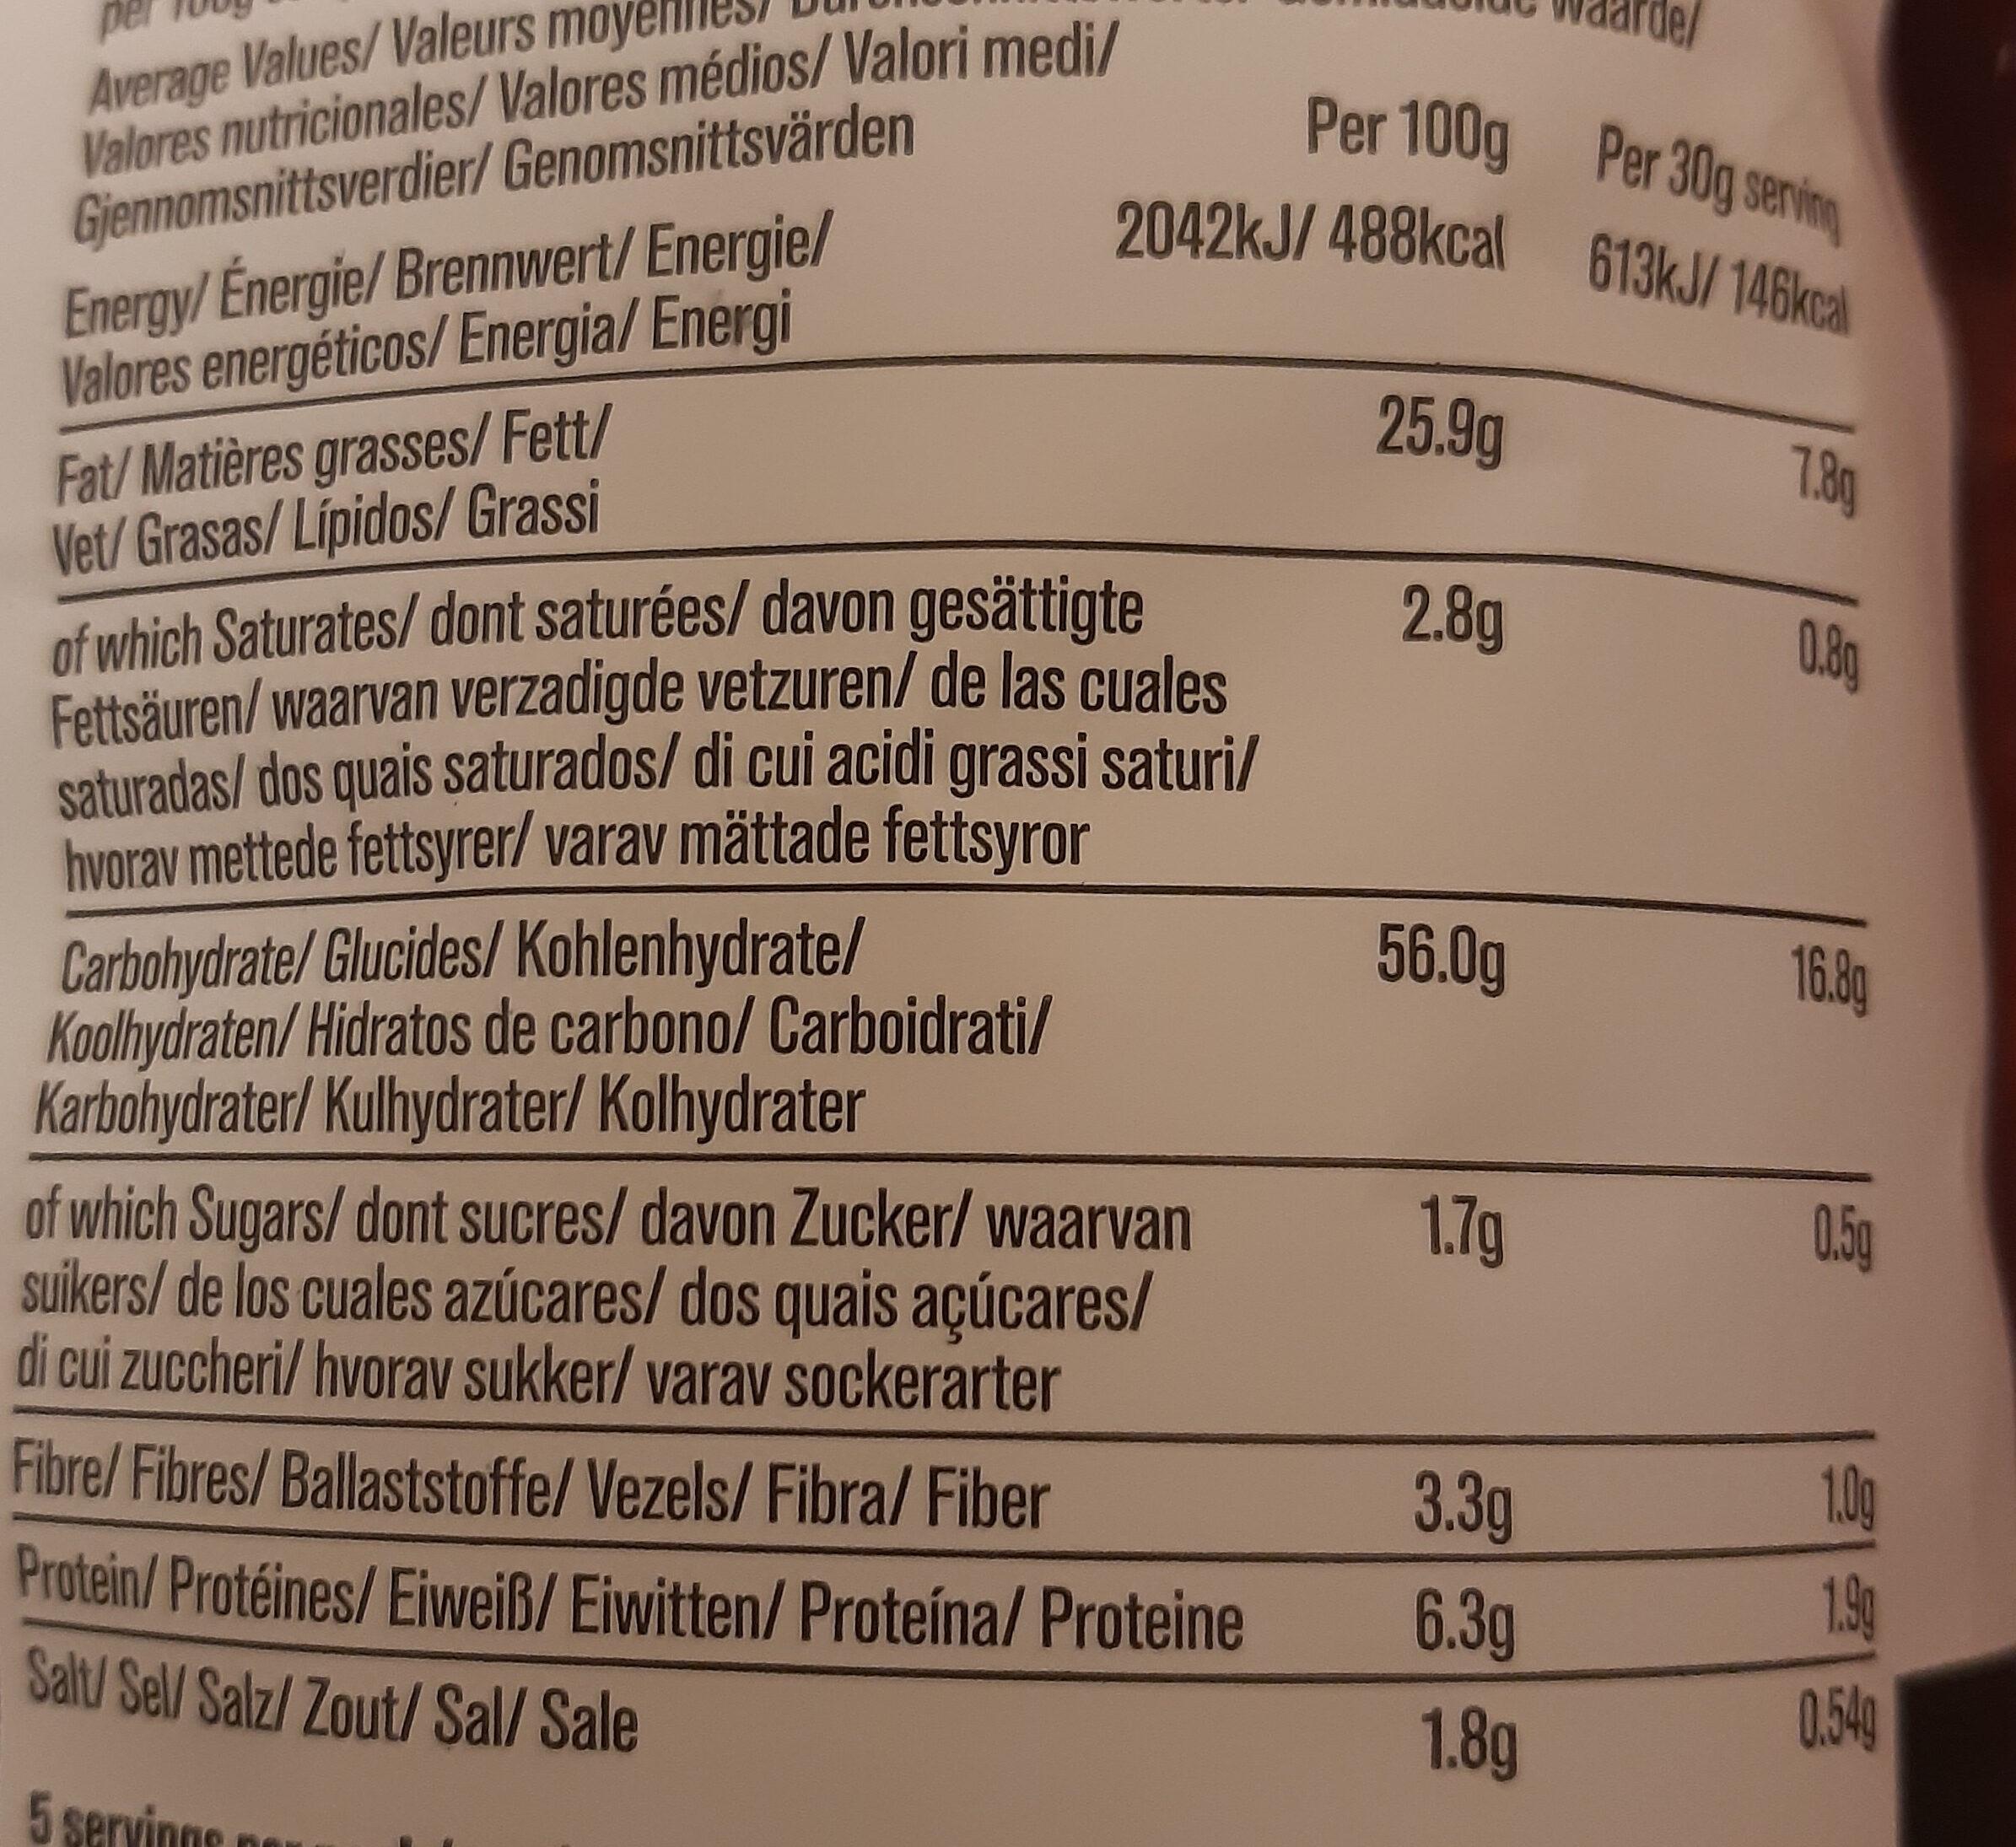 Sea salt & cider vinegar - Valori nutrizionali - it